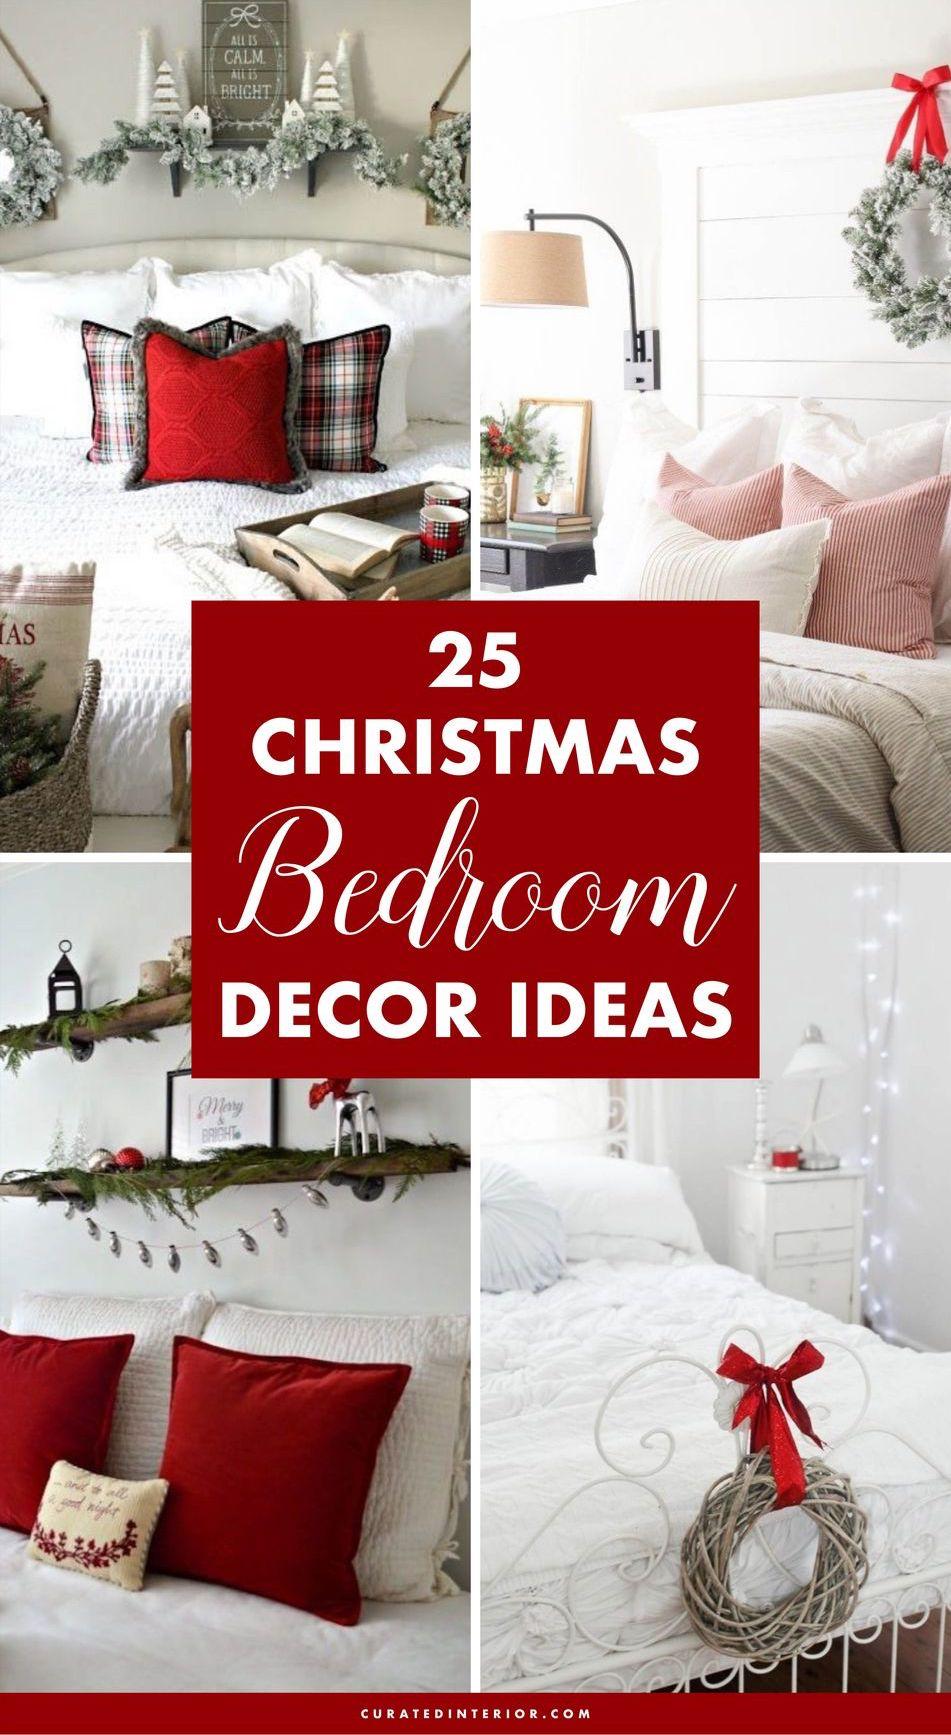 25 BEST Christmas Bedroom Decor Ideas #ChristmasDecor #ChristmasBedroom #ChristmasBedroomDecor